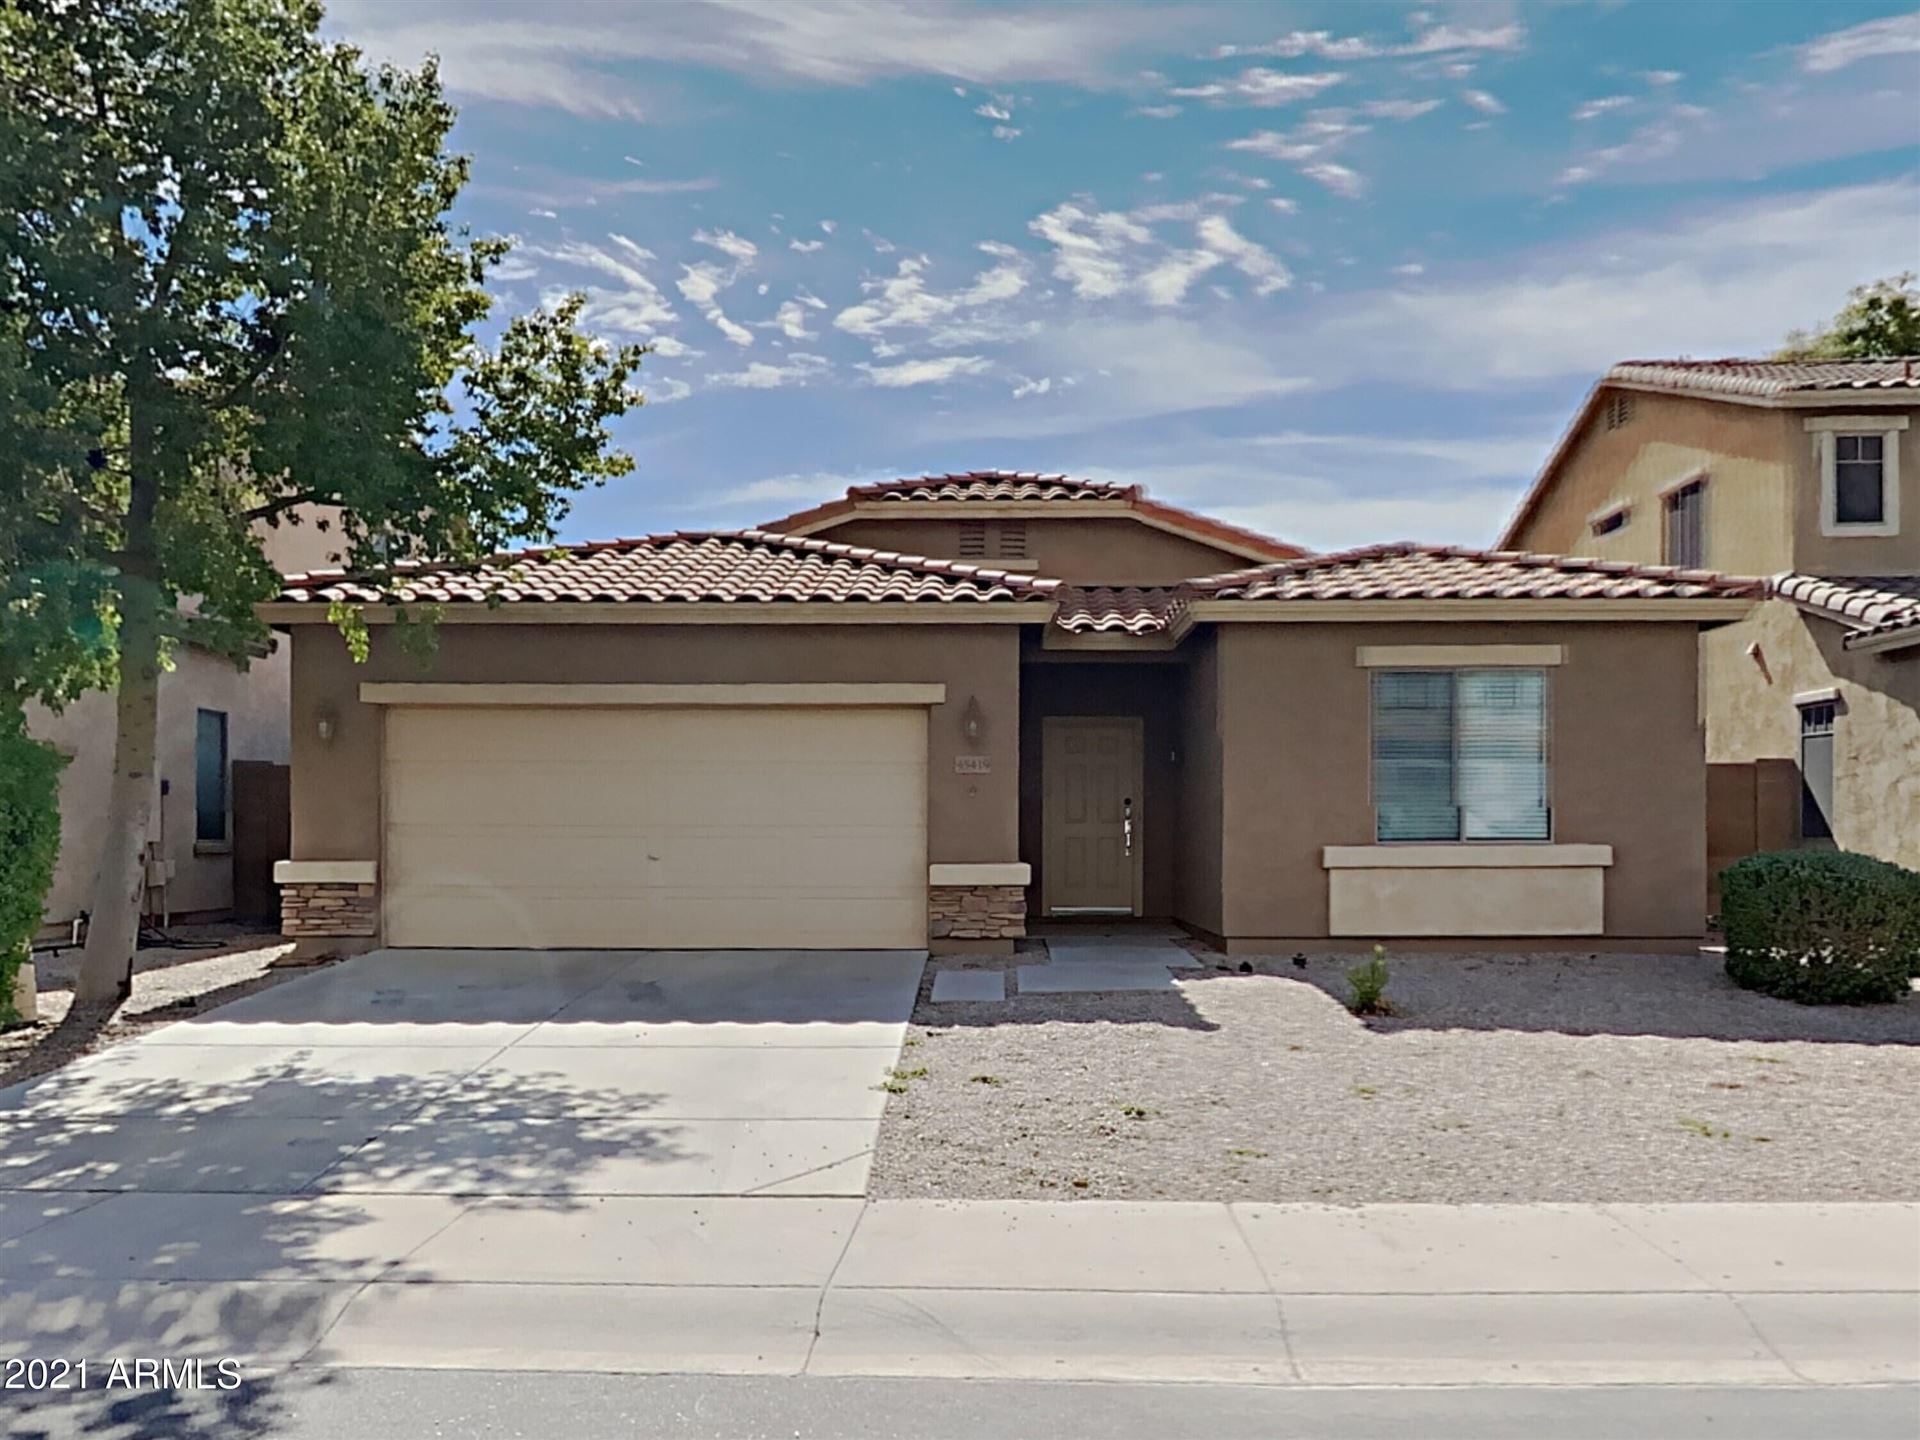 Photo of 45419 W GAVILAN Drive, Maricopa, AZ 85139 (MLS # 6306584)